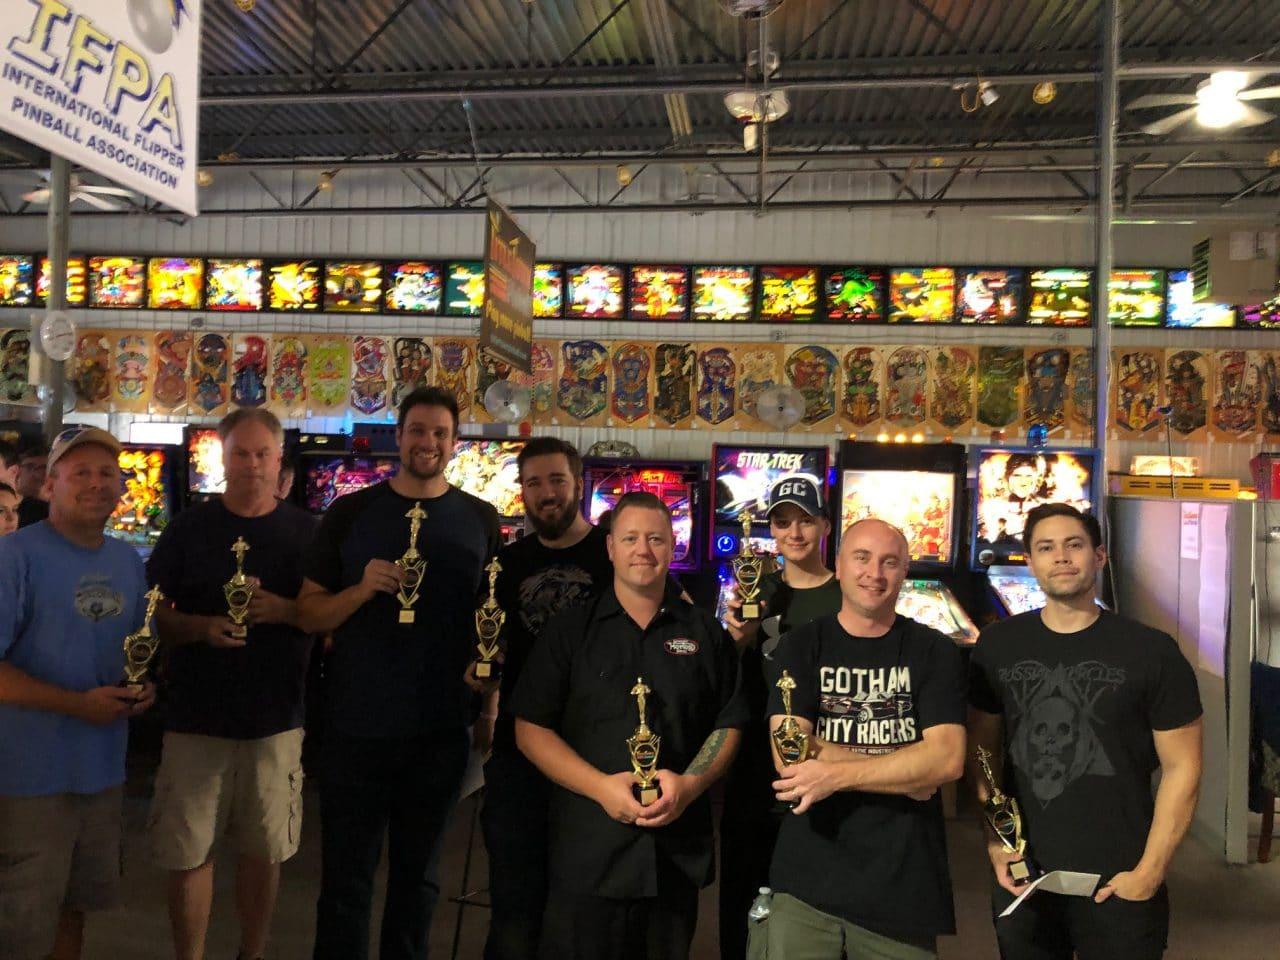 2019 Summer 2X Match Play Pinball Tournament in Green Bay, WI